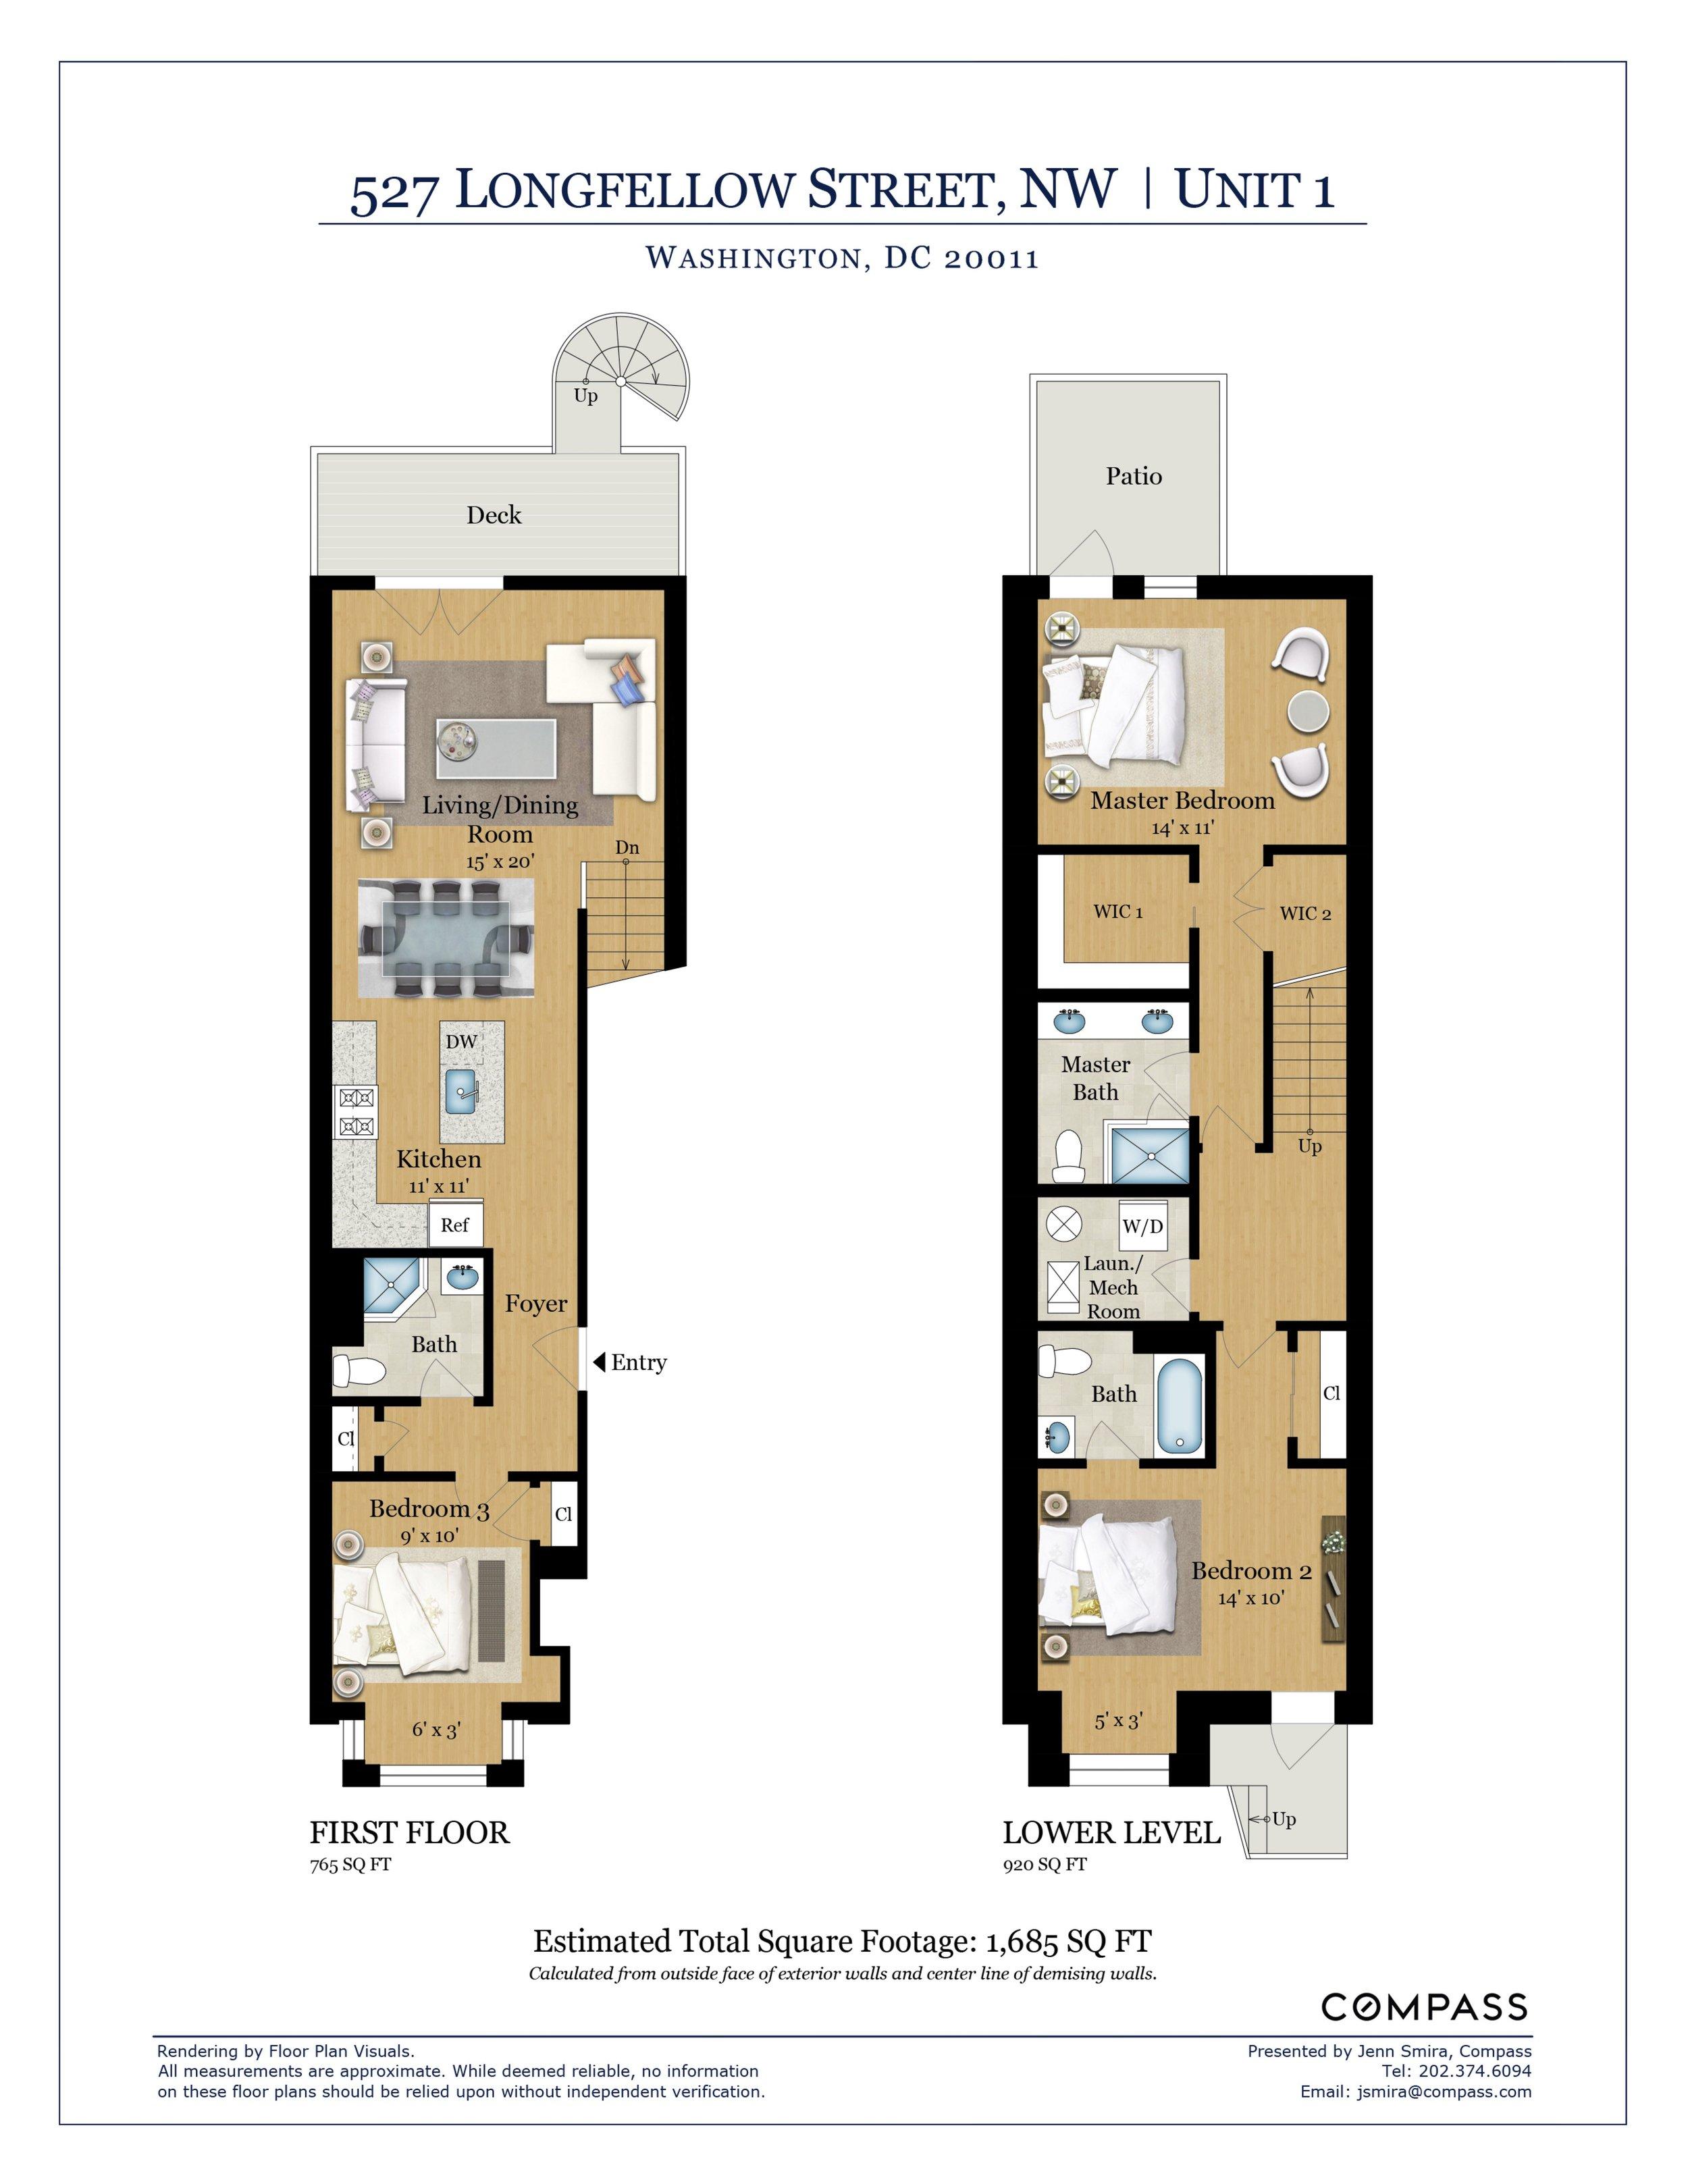 JS-527LongfellowStNW#1-FloorPlan-Print-compressor.jpg